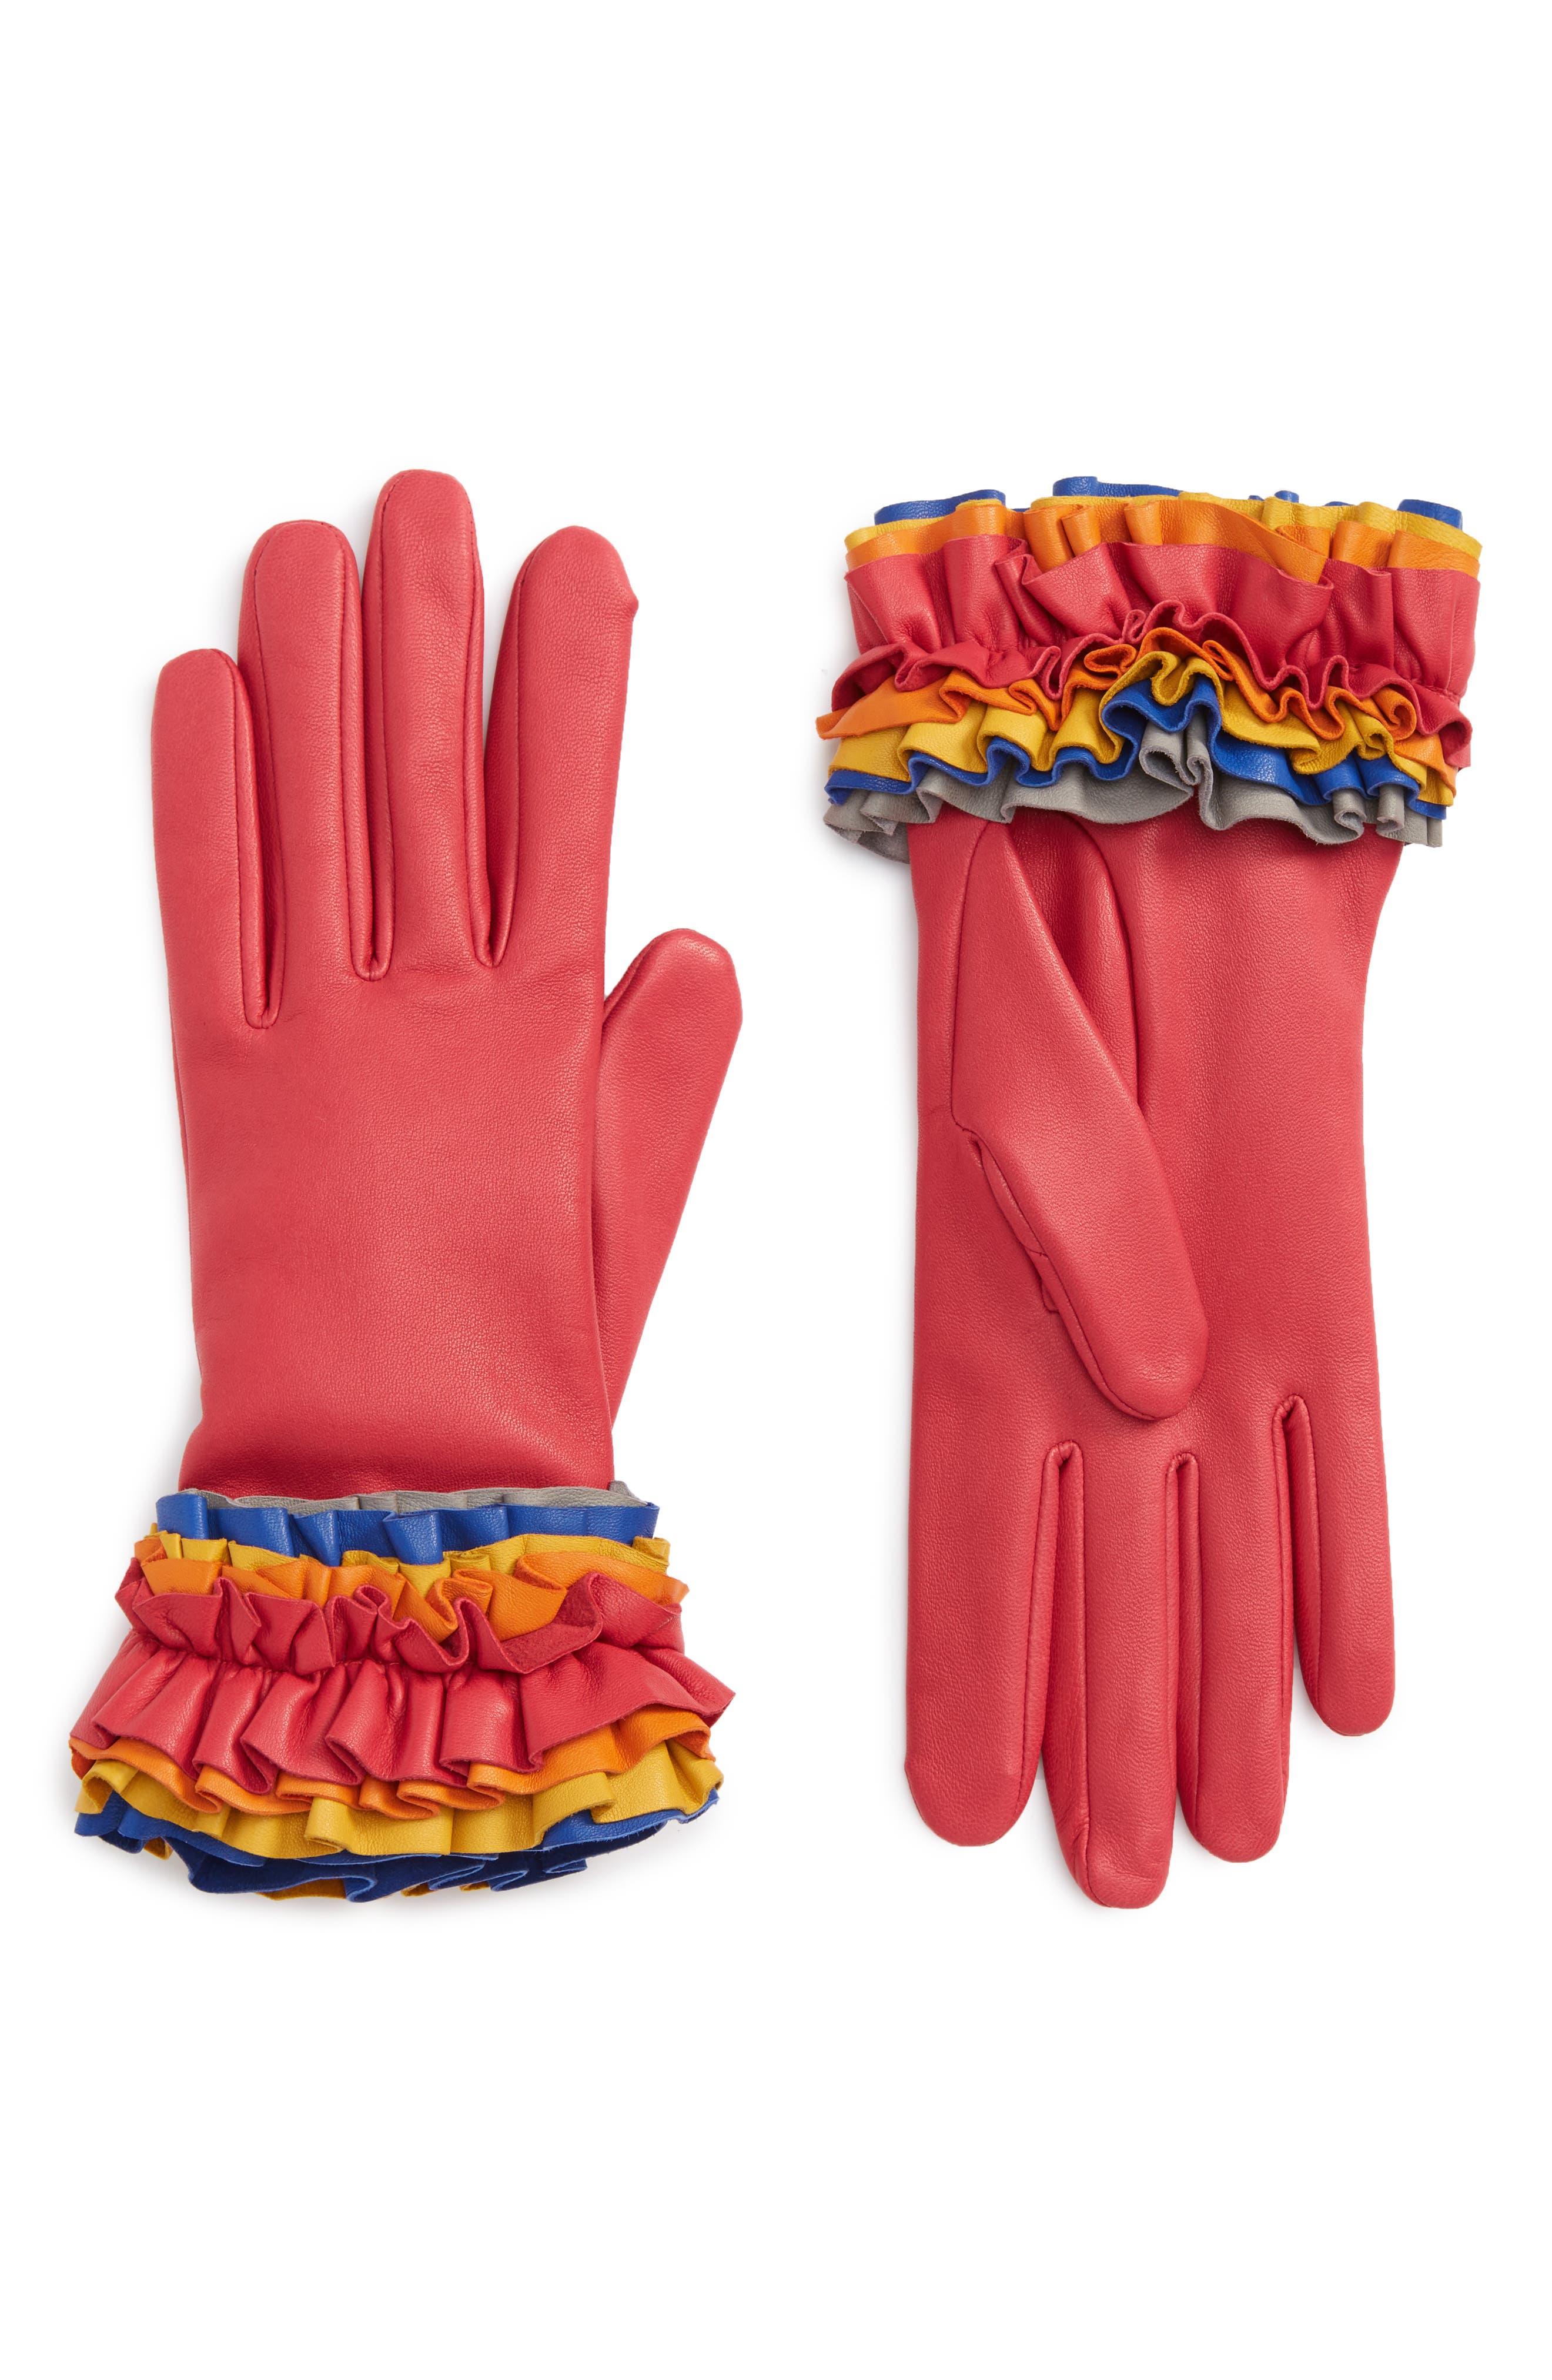 Main Image - Agnelle Ruffle Lambskin Leather Gloves